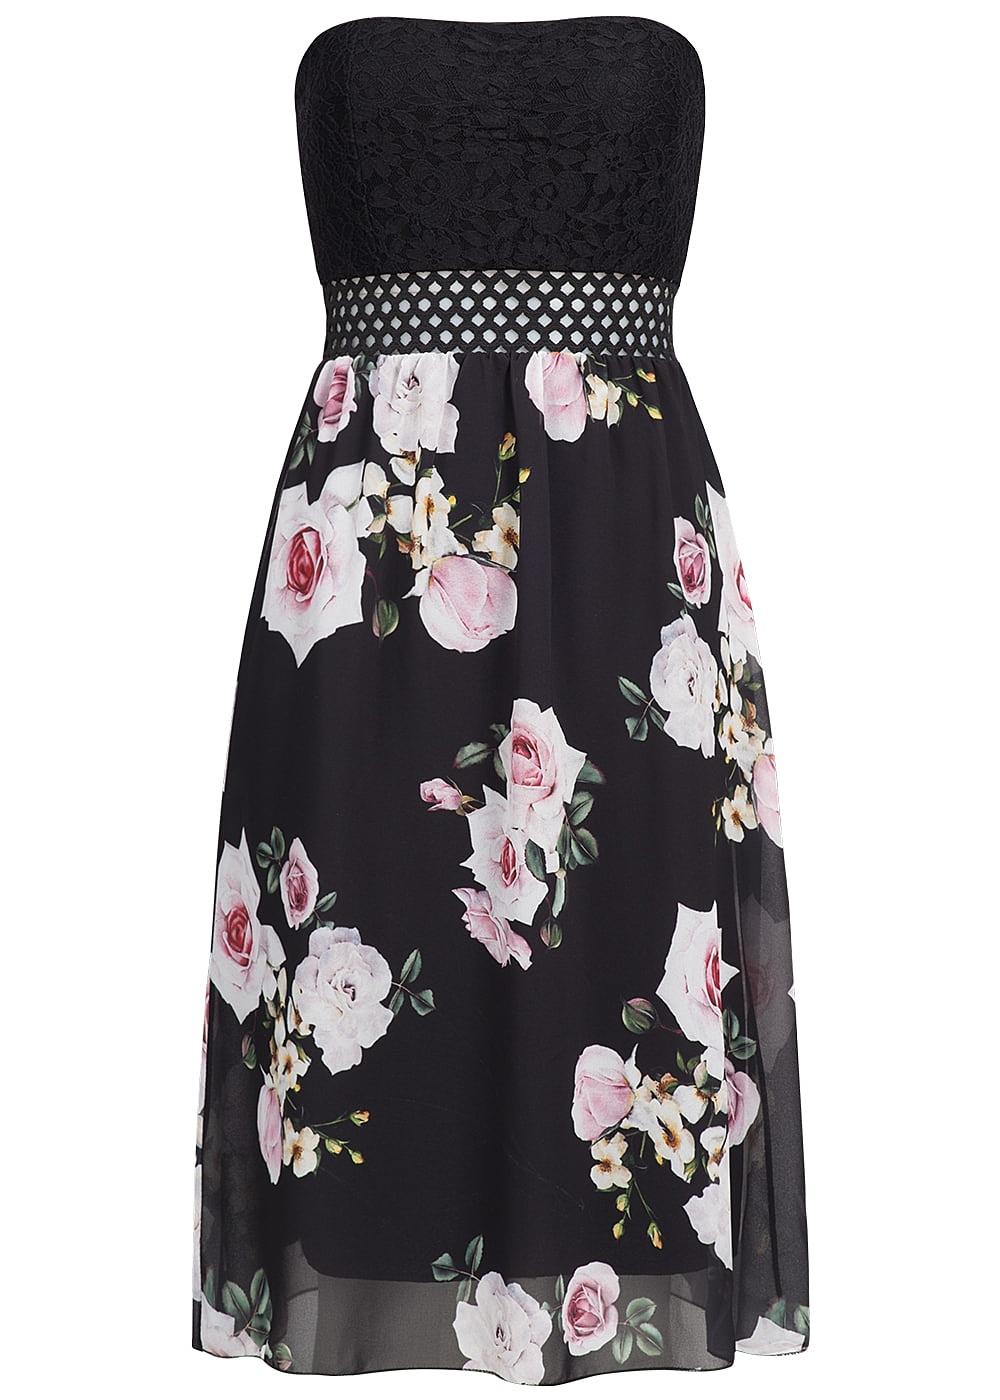 styleboom fashion damen midi bandeau kleid blumen muster brustpads gitter schwarz rosa. Black Bedroom Furniture Sets. Home Design Ideas